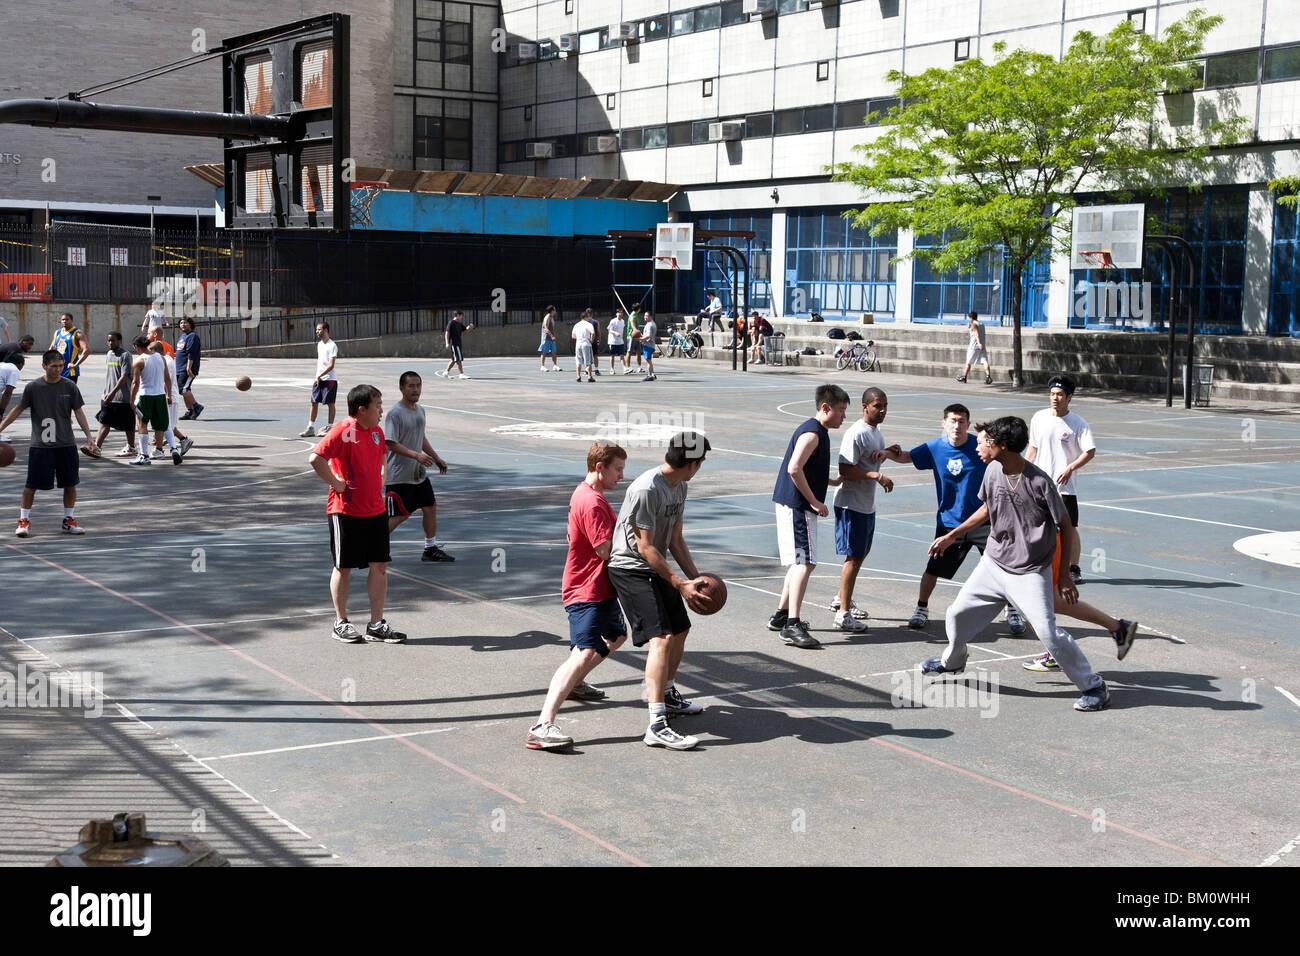 multiethnic street basketball game underway in spring sunshine on high school playground in 'Hells Kitchen' - Stock Image